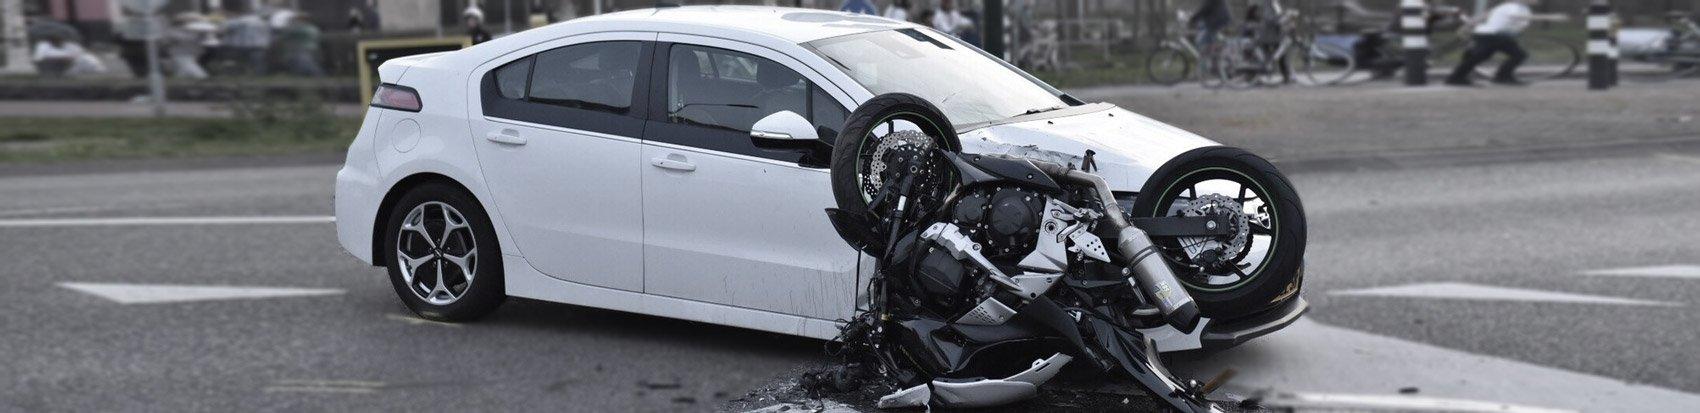 Motorongeval schadevergoeding | LetselPro